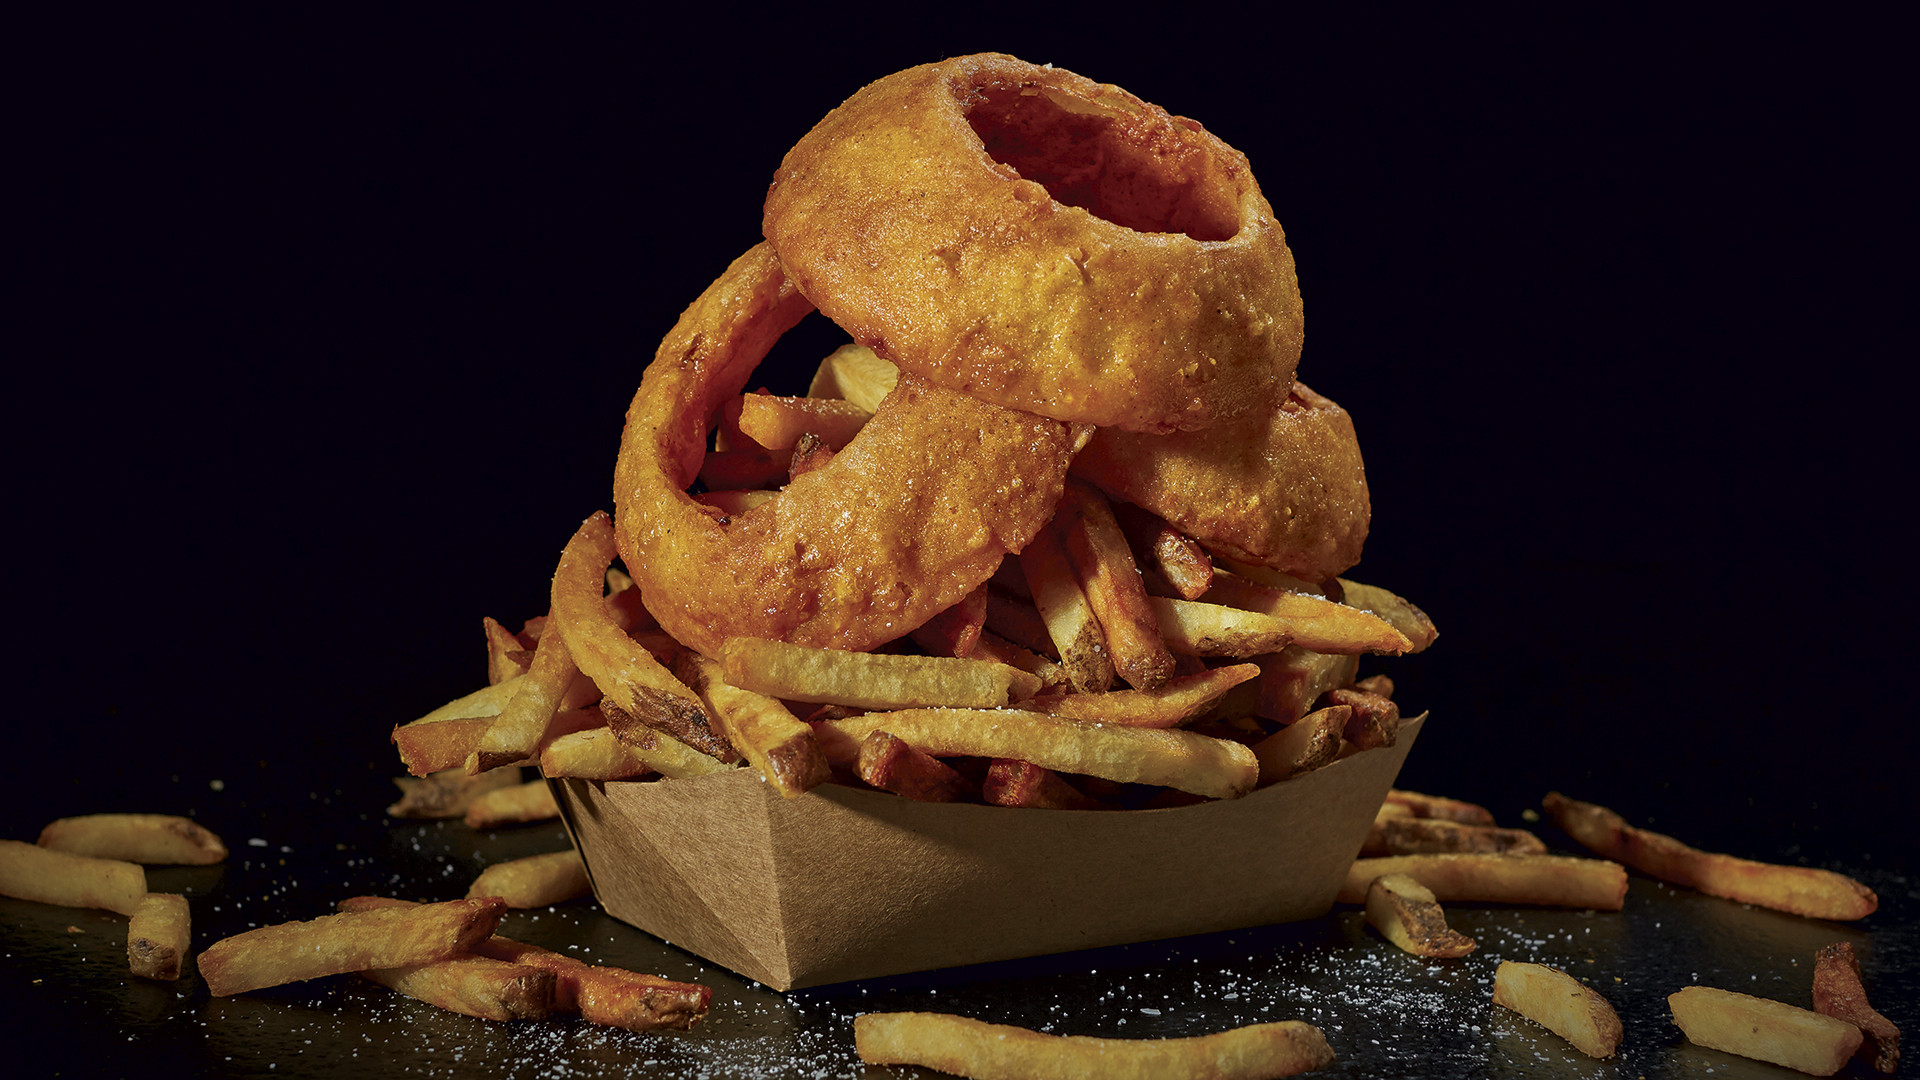 Onion rings at BurgerFi